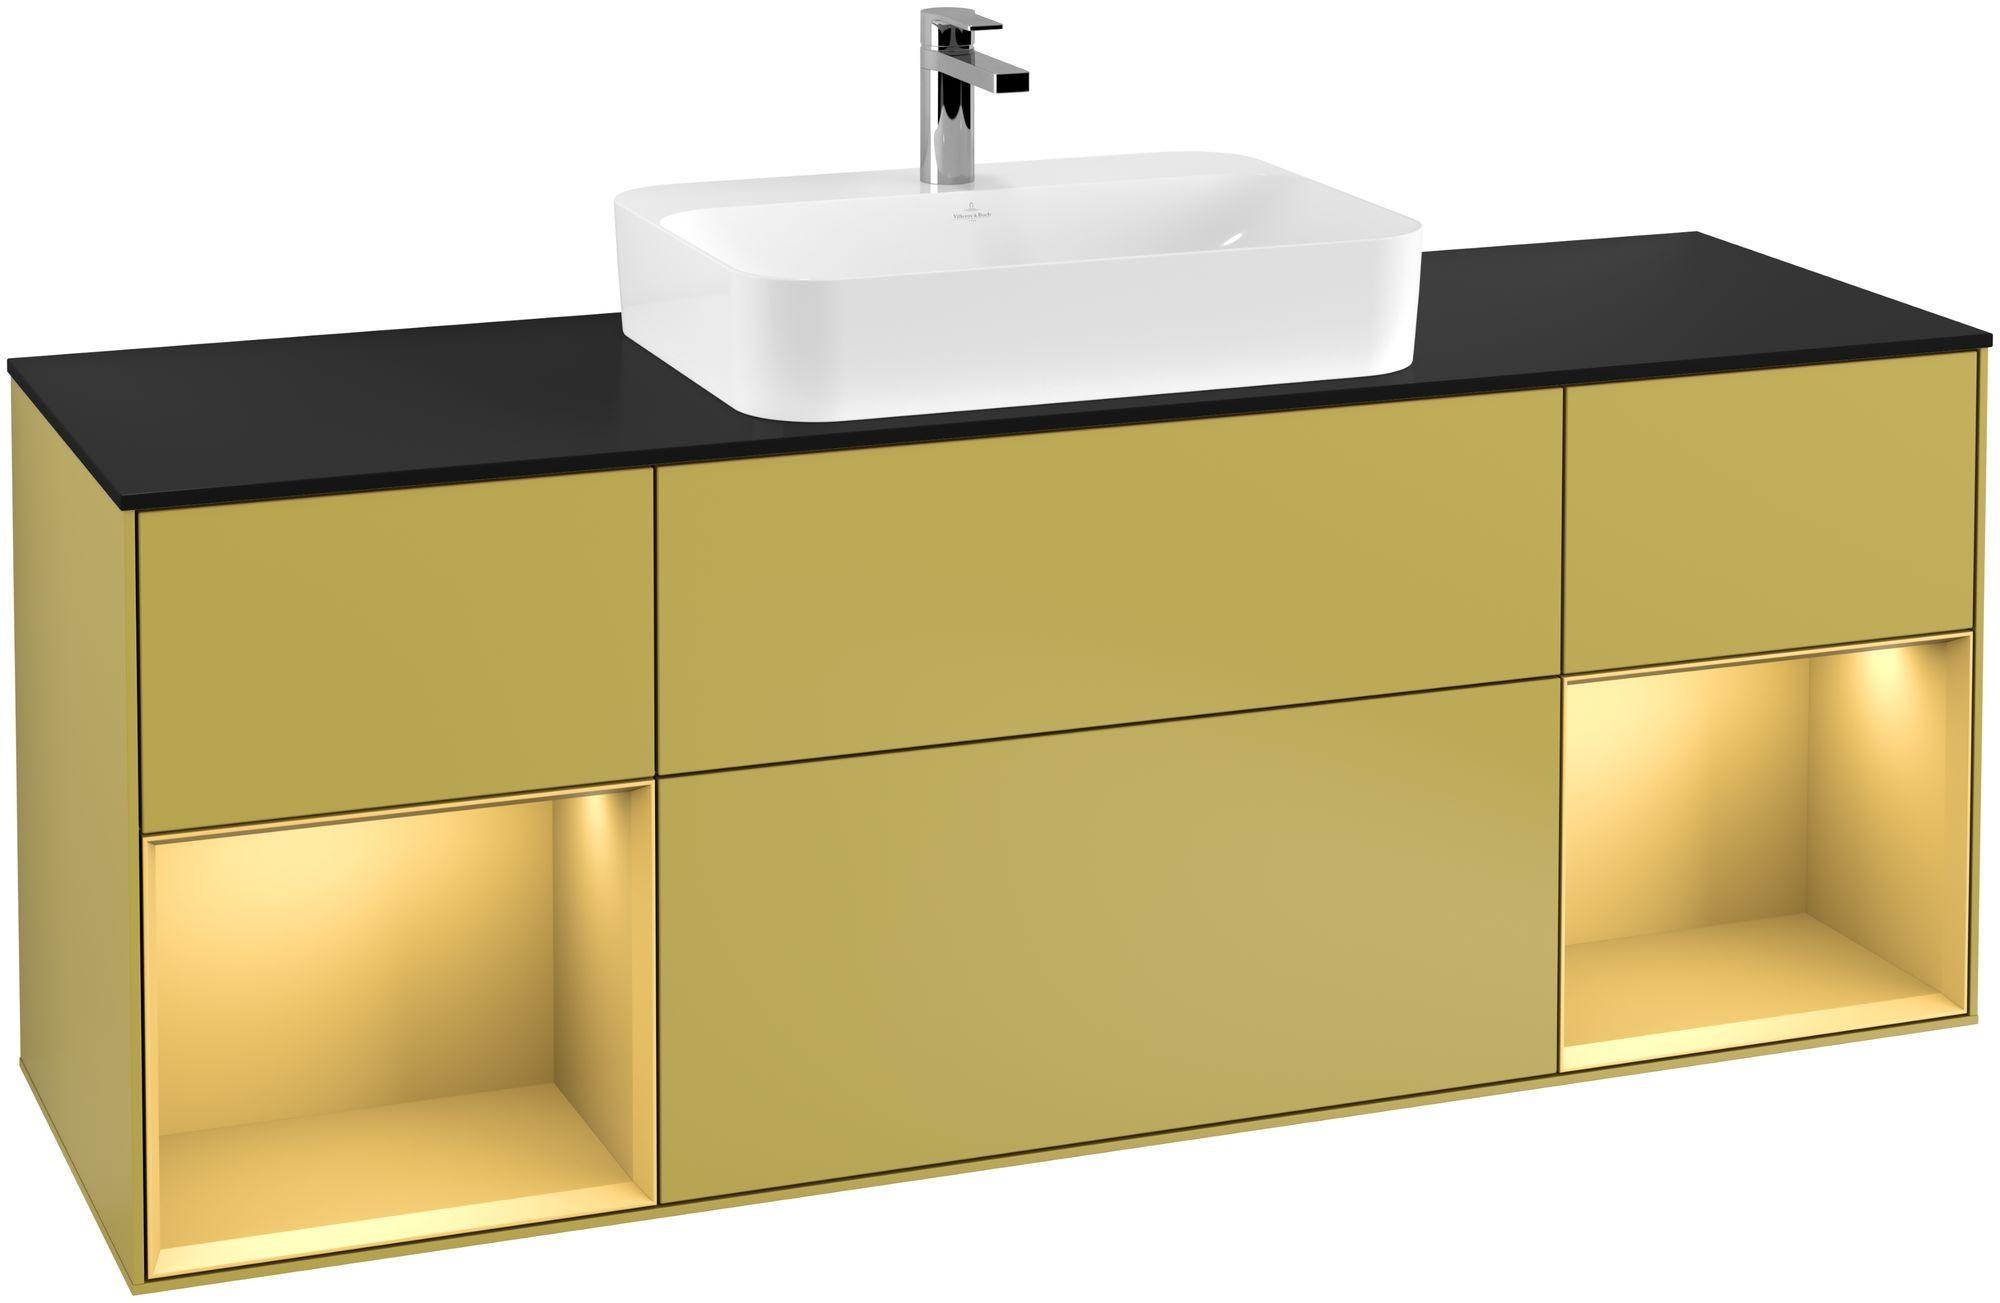 Villeroy & Boch Finion F45 Waschtischunterschrank mit Regalelement 4 Auszüge Waschtisch mittig LED-Beleuchtung B:160xH:60,3xT:50,1cm Front, Korpus: Sun, Regal: Gold Matt, Glasplatte: Black Matt F452HFHE